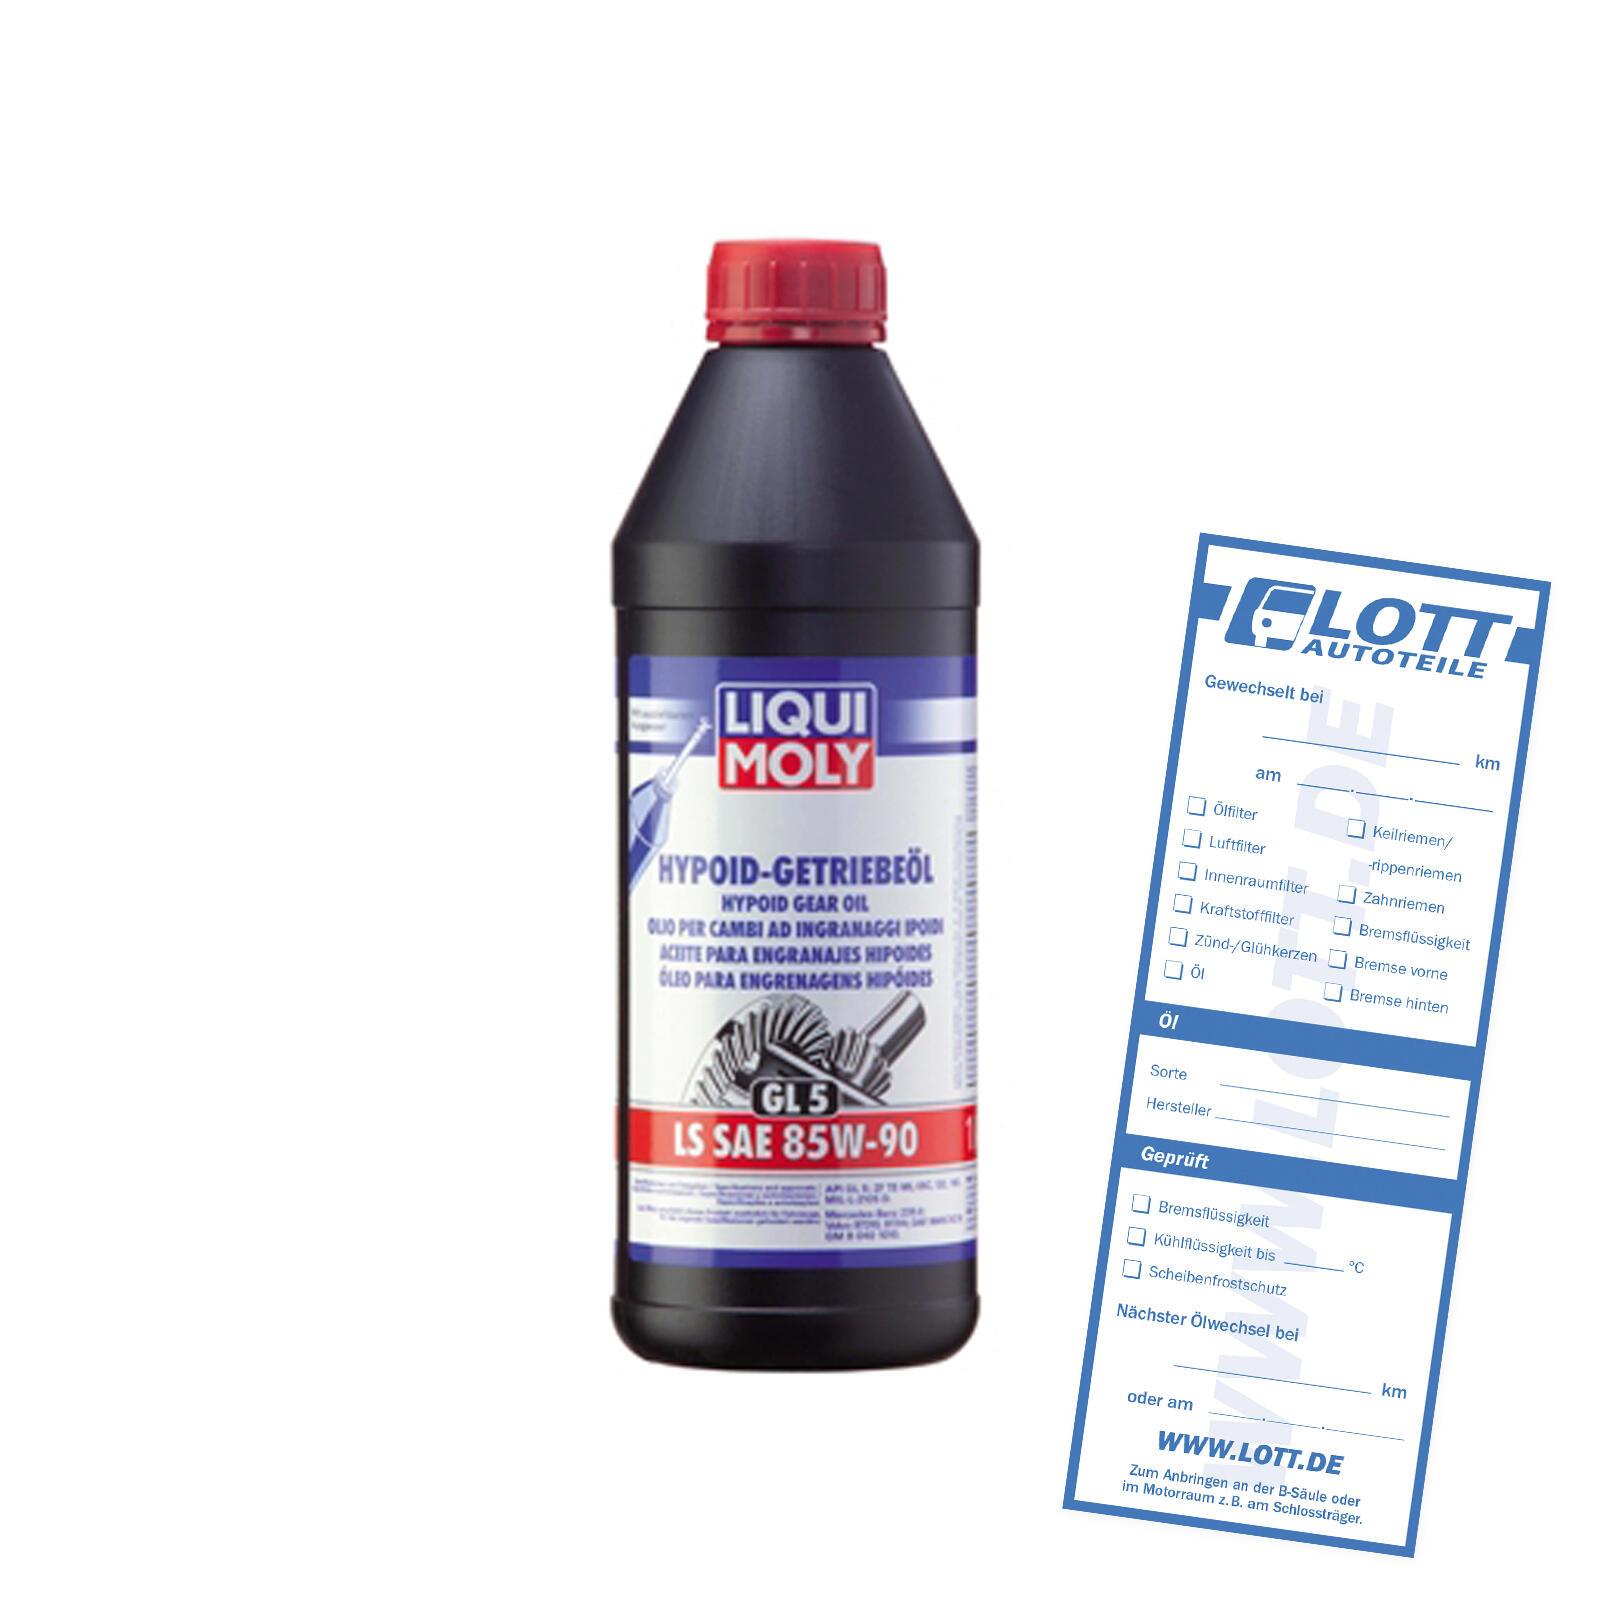 Liqui Moly Hypoidgetriebeöl SAE 85W-90